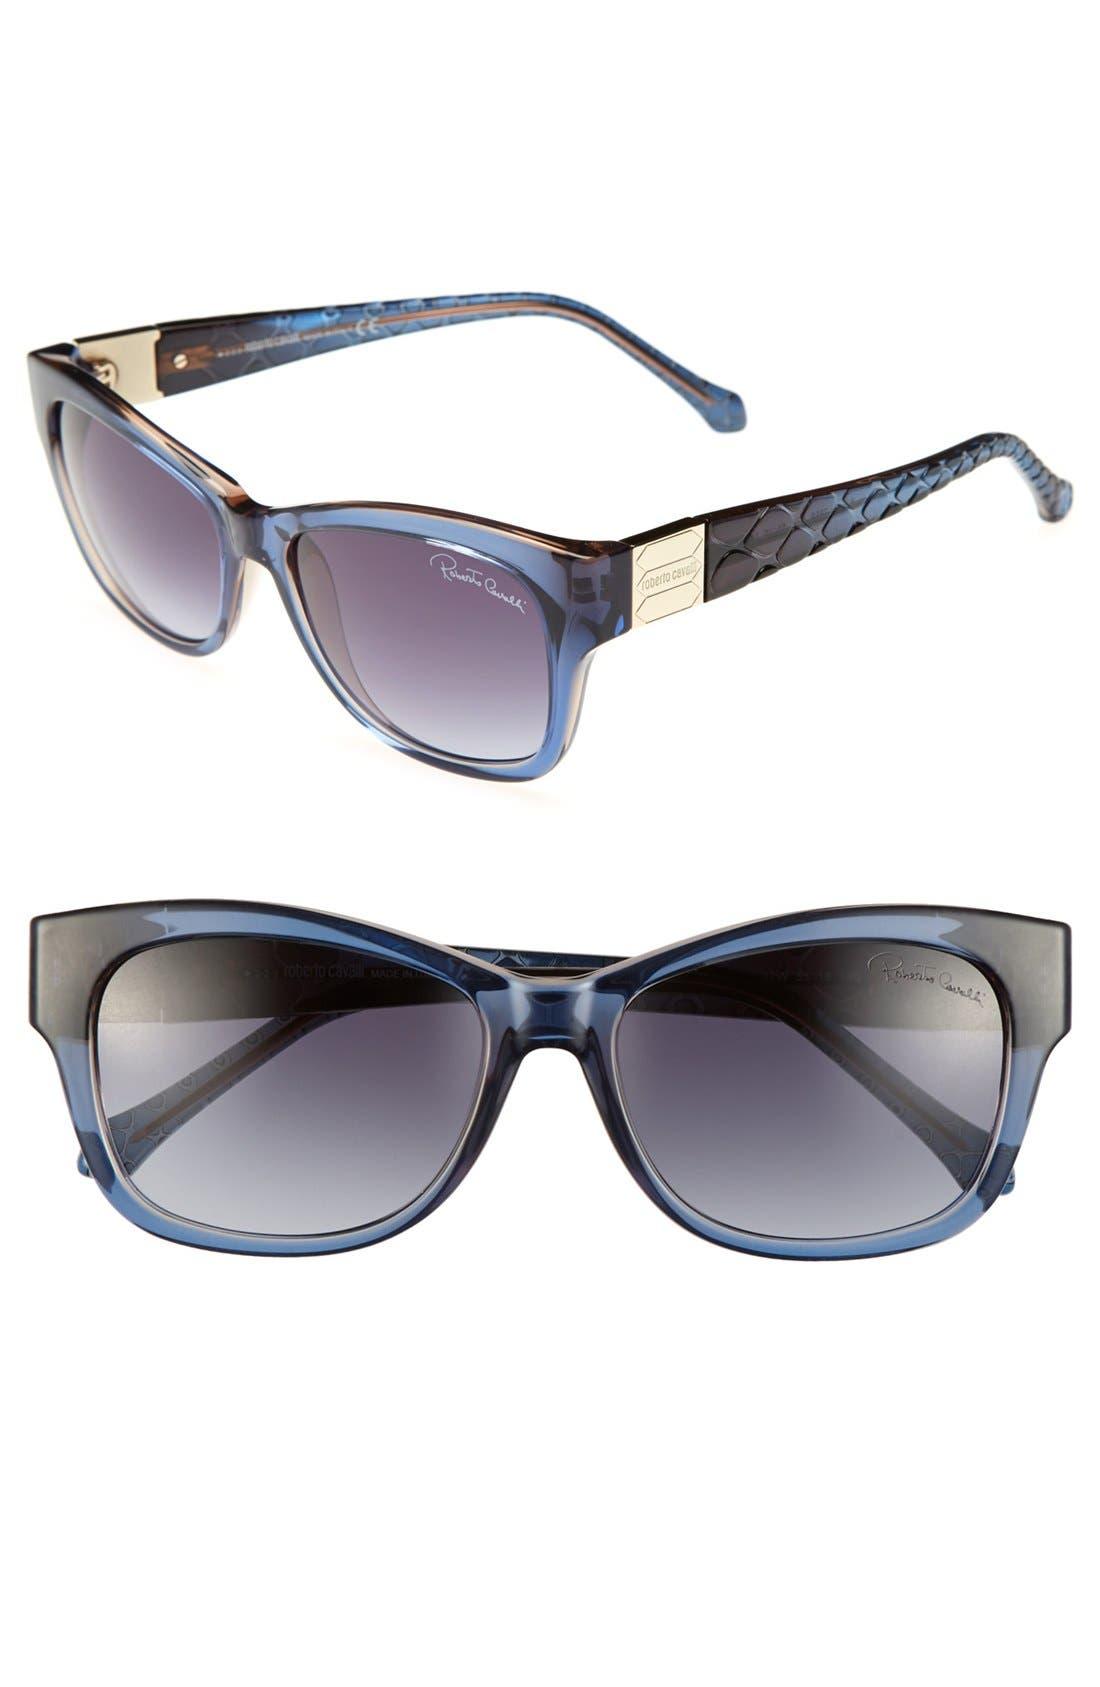 Main Image - Roberto Cavalli 'Acamar' 55mm Sunglasses